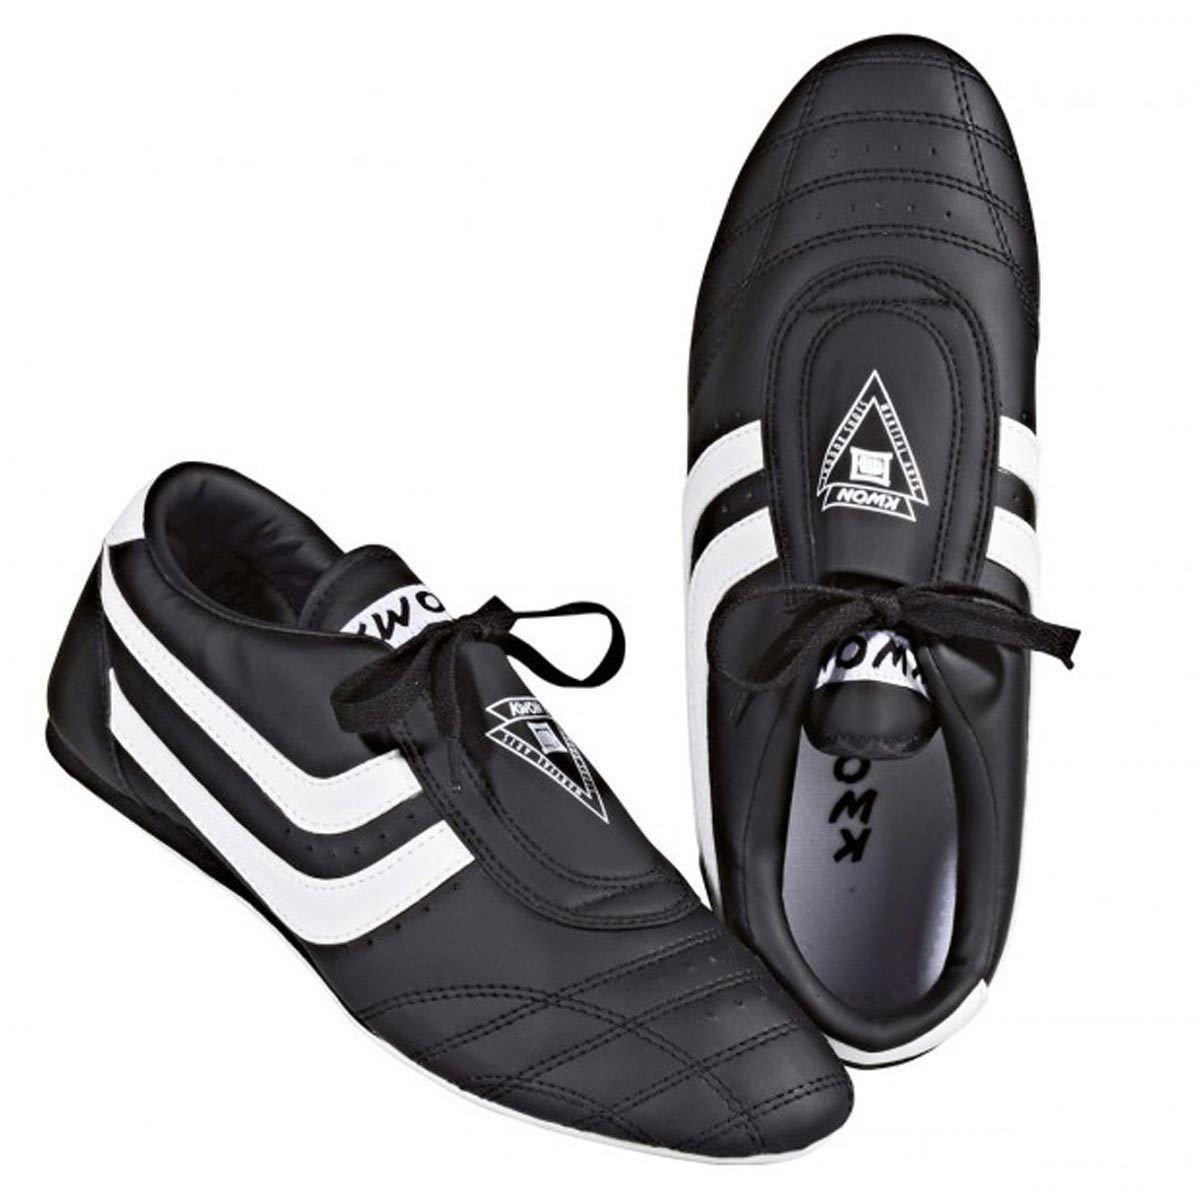 Kwon Chosun Plus training shoes